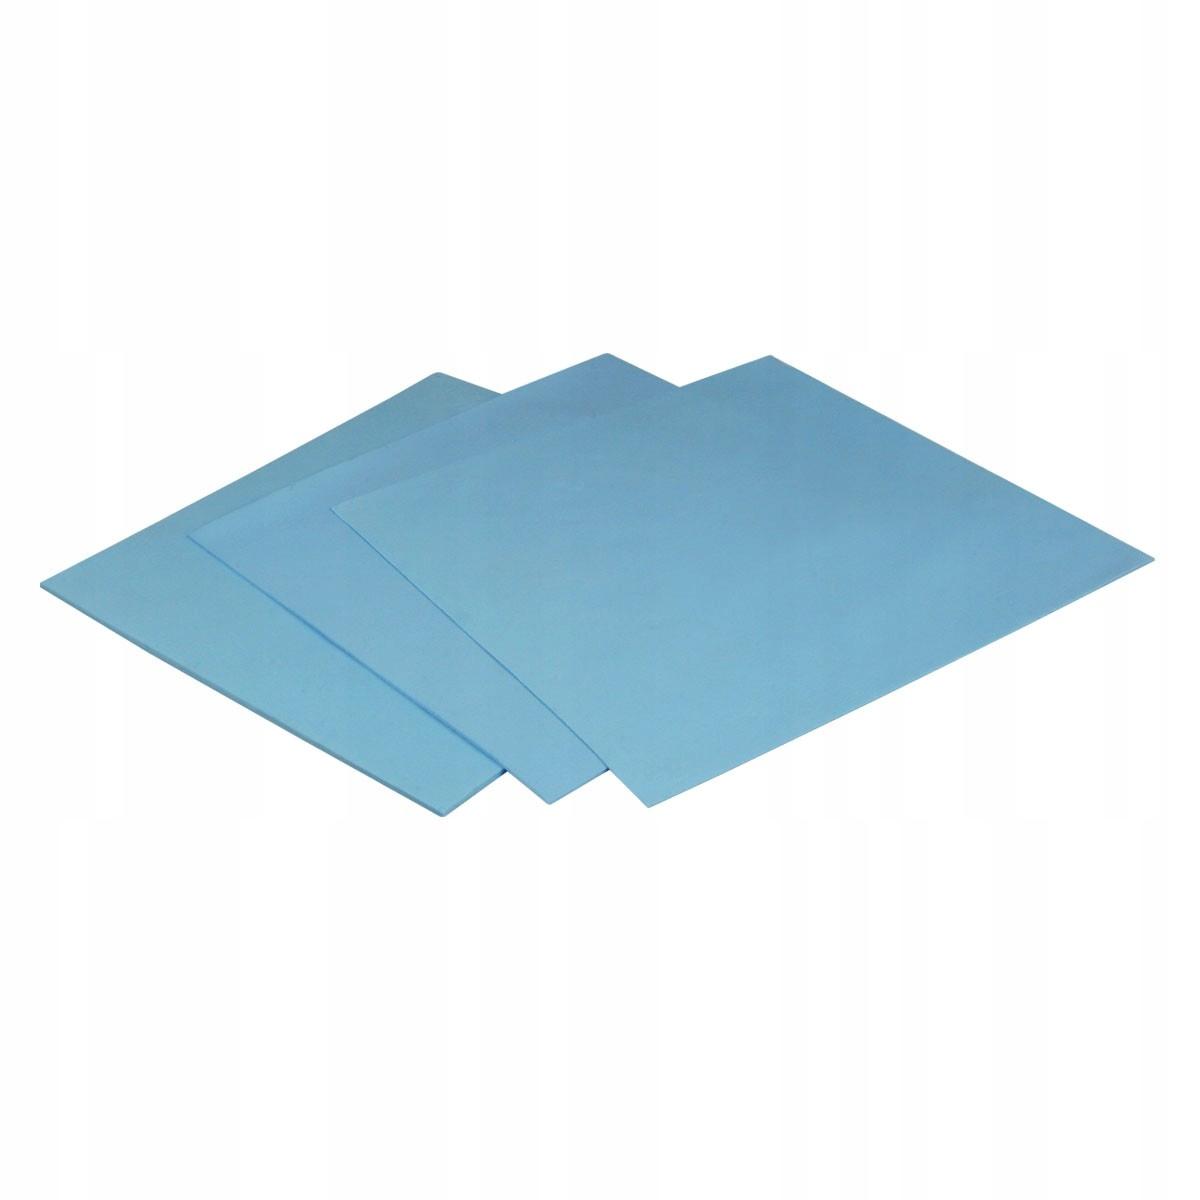 ARCTIC THERMAL PAD 50x50x1,5 мм termopad